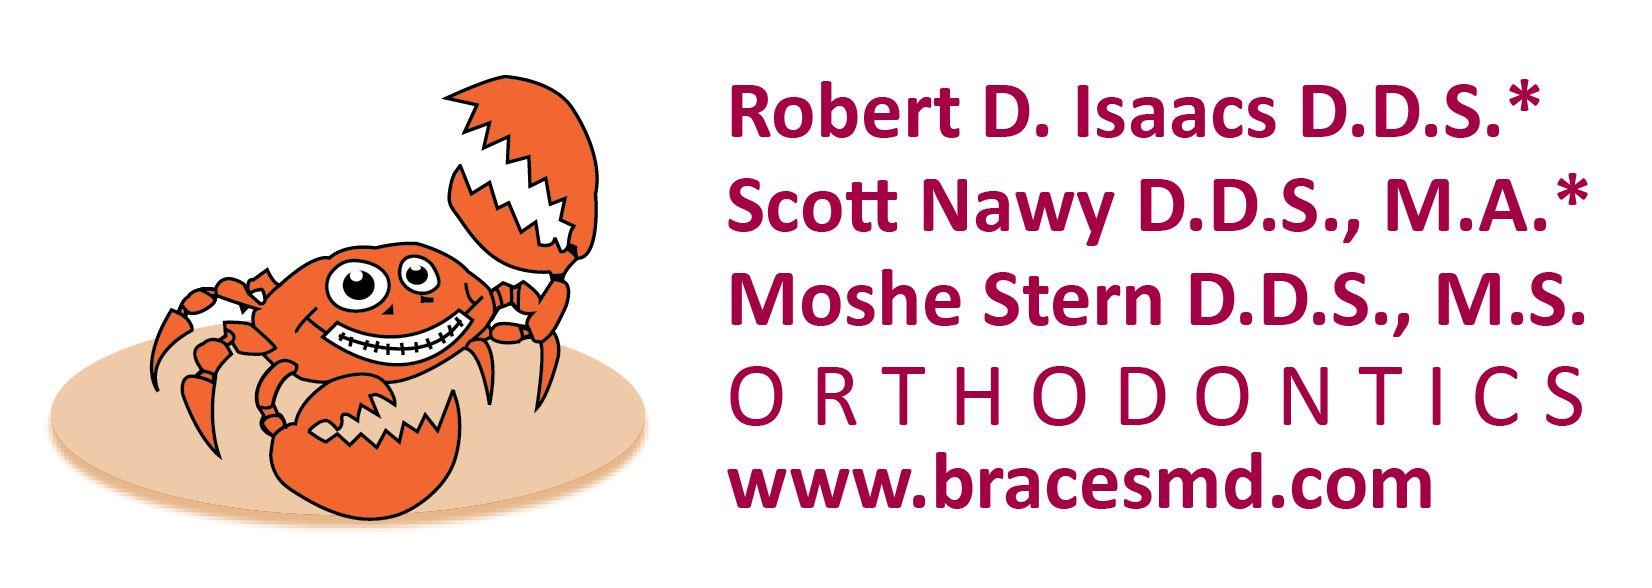 Dr. Scott Nawy Dr. Moshe Stern